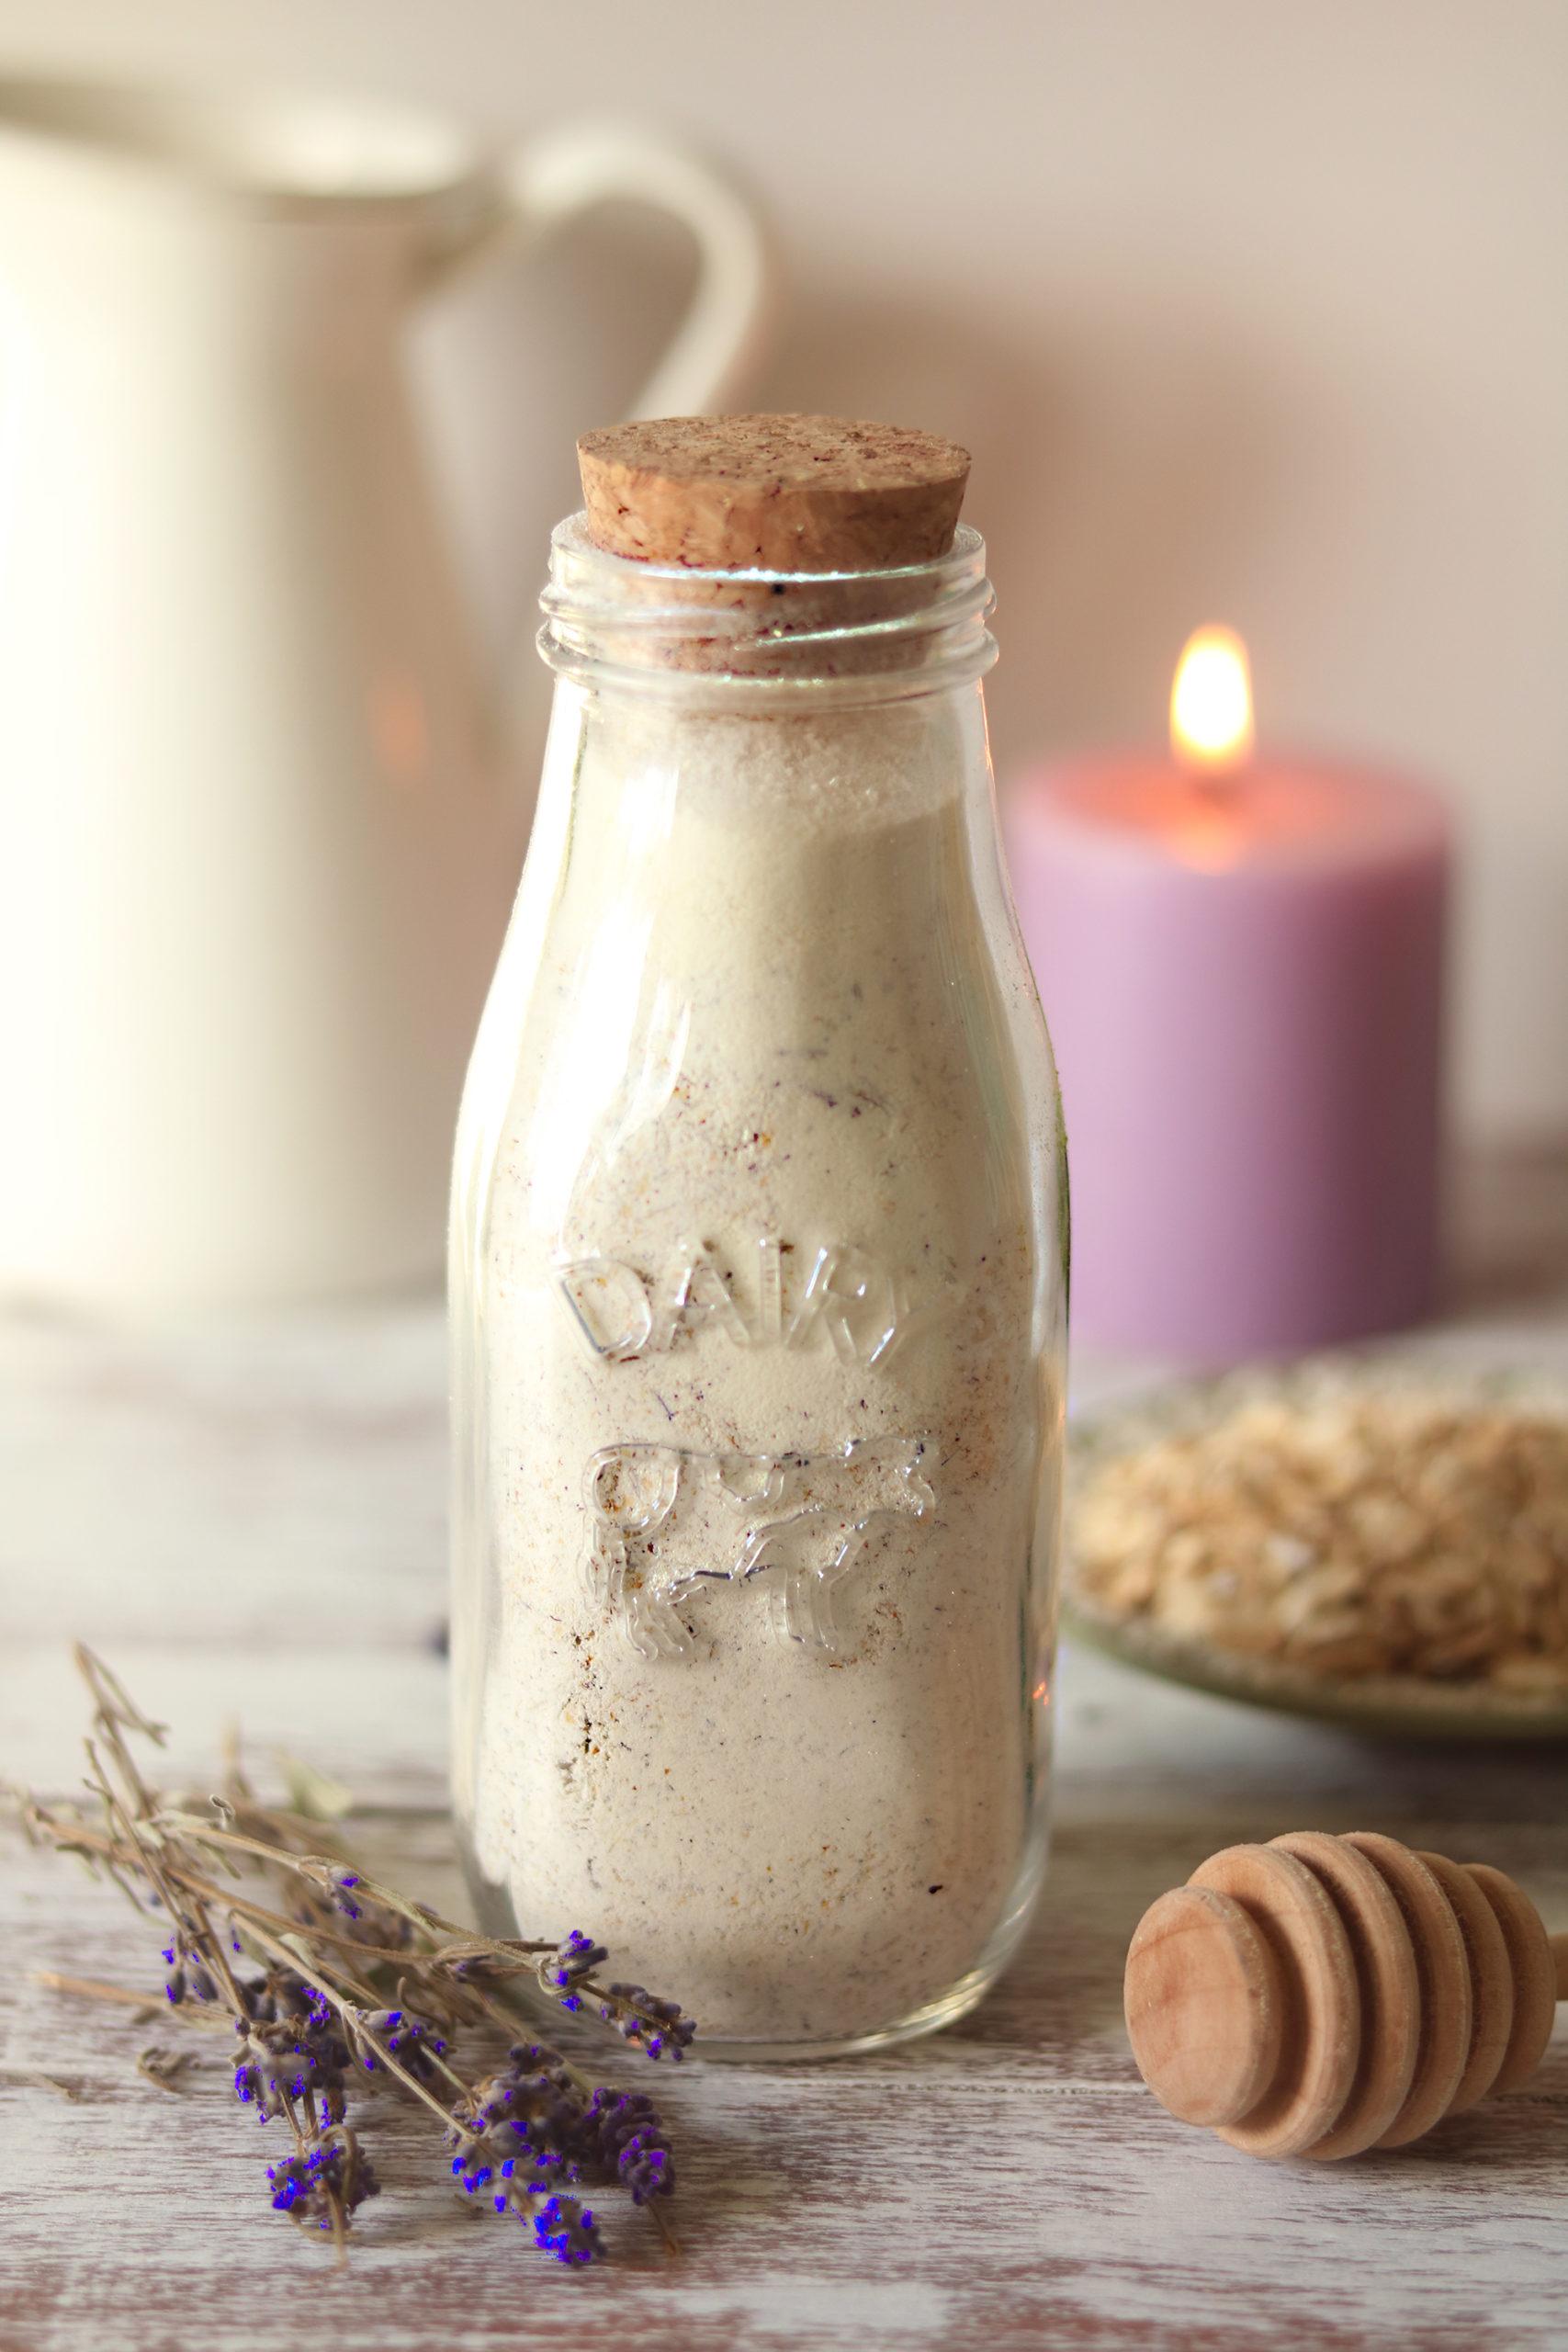 Imbolc DIY Oatmeal & Honey Milk Bath with Lavender